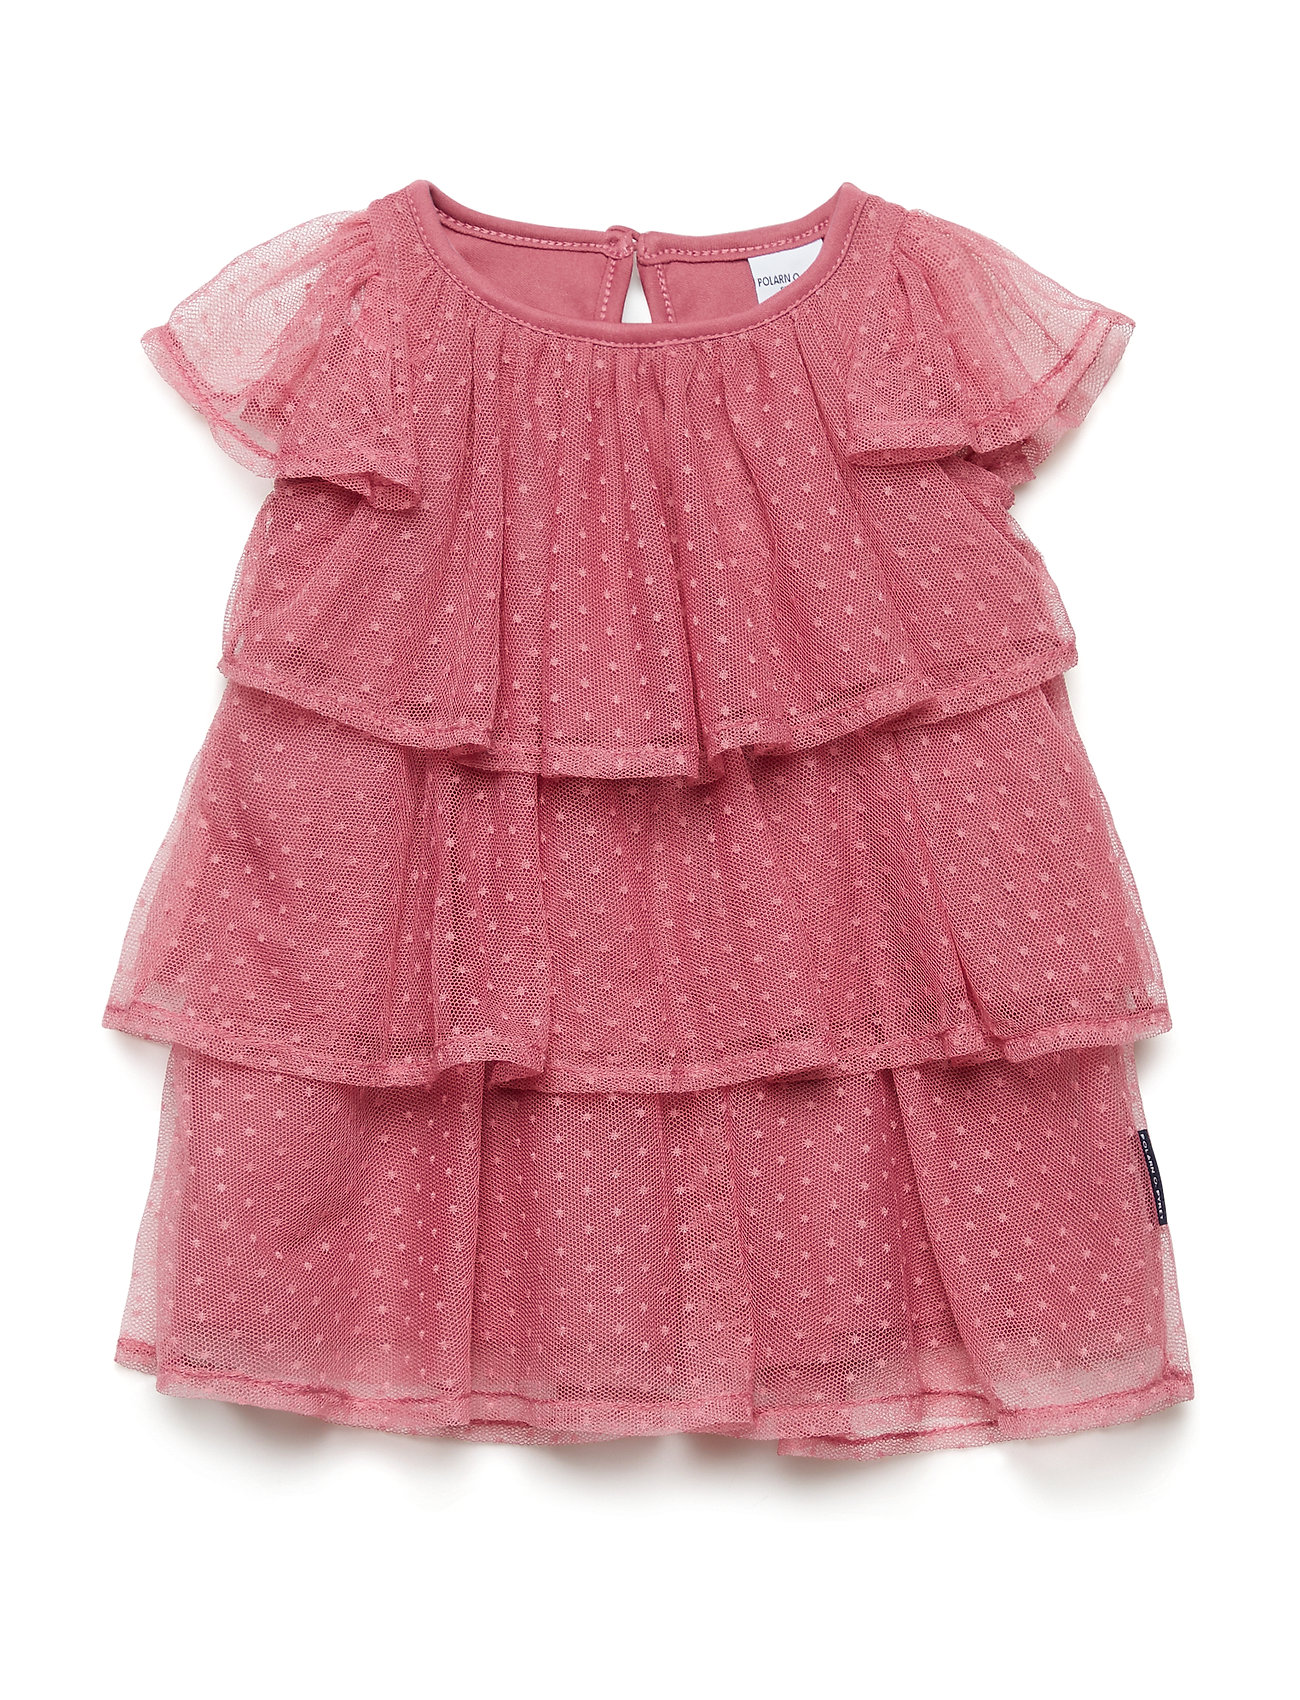 Polarn O. Pyret Dress Tulle Baby